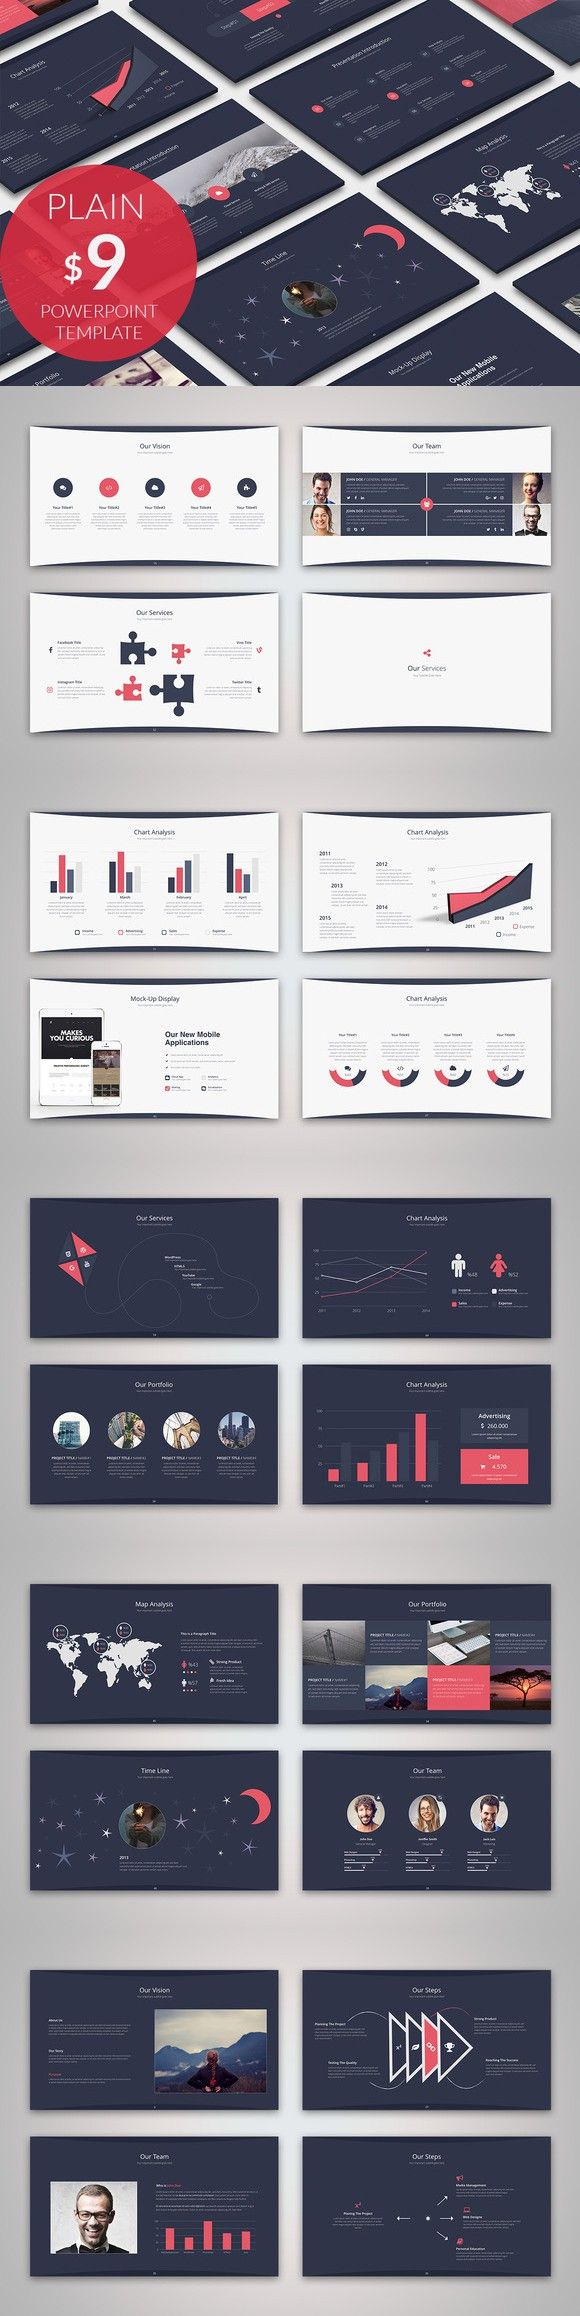 Plain Business Powerpoint Template | Business powerpoint templates ...